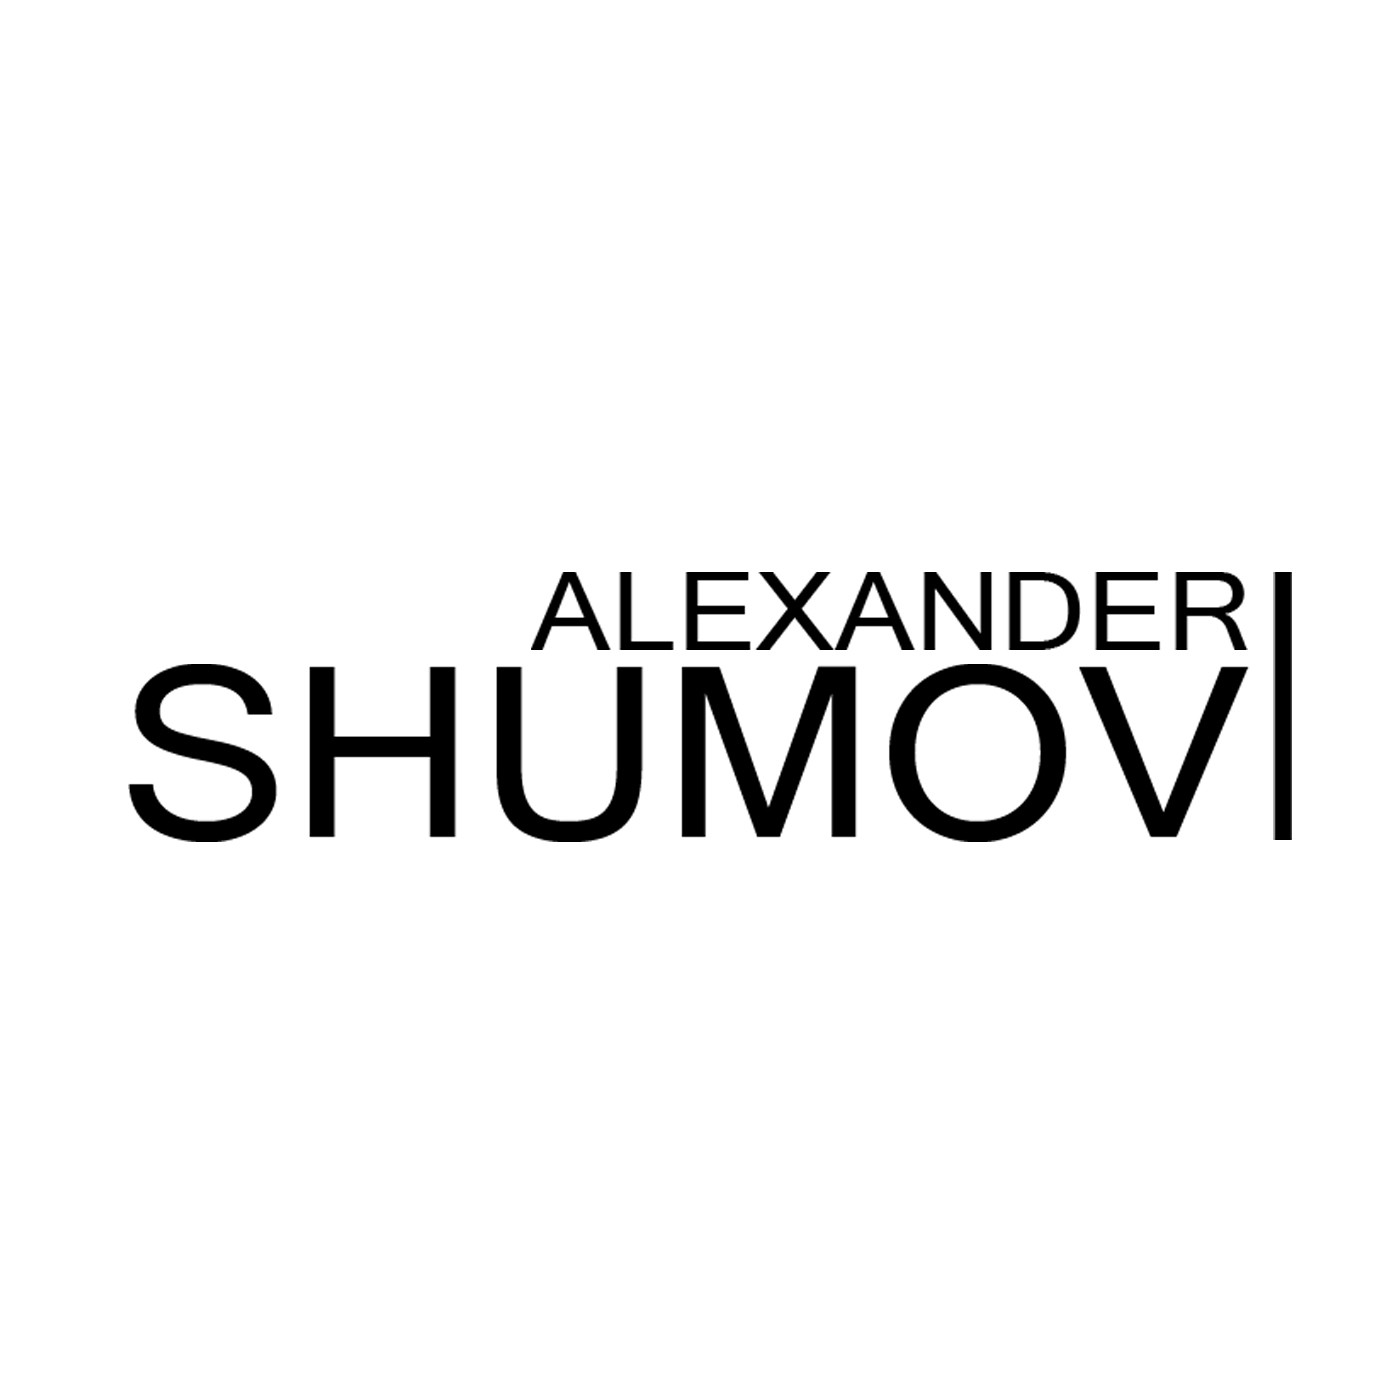 Alexander Shumov